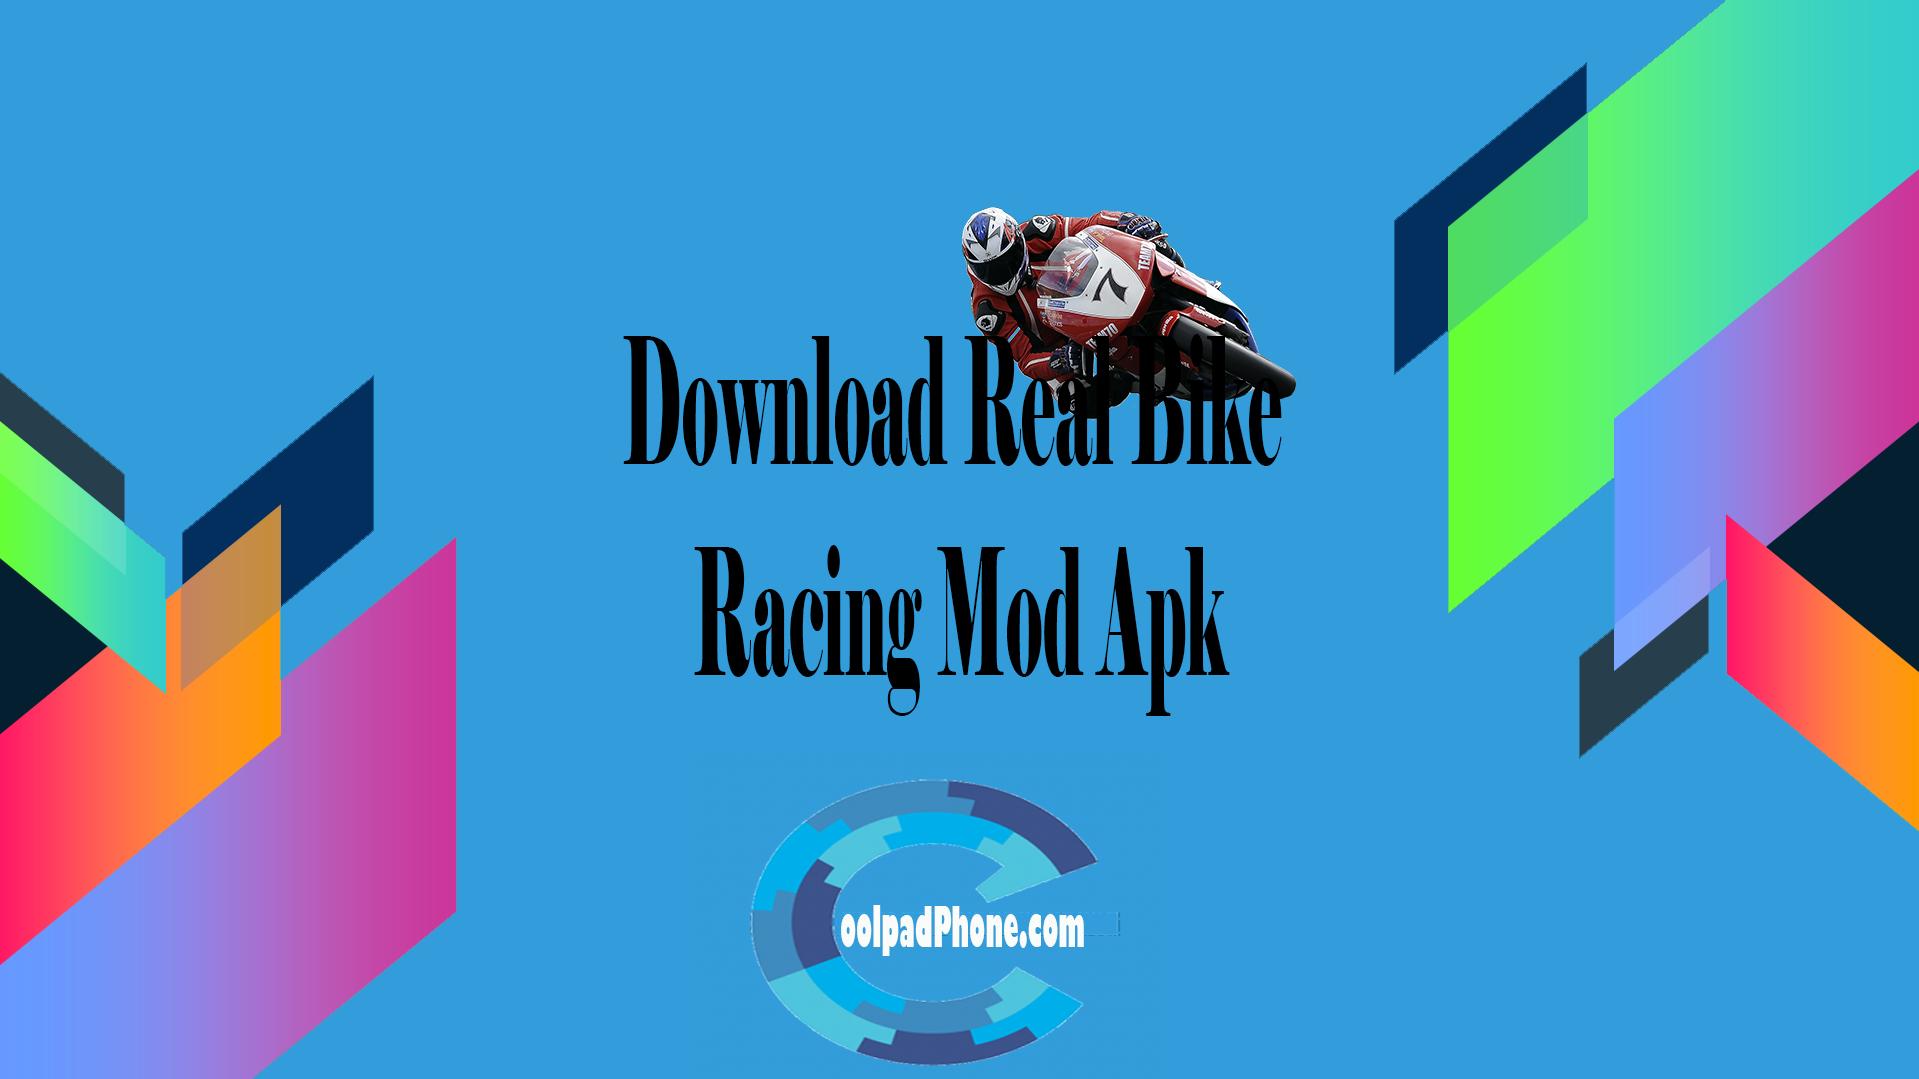 Download Real Bike Racing Mod Apk